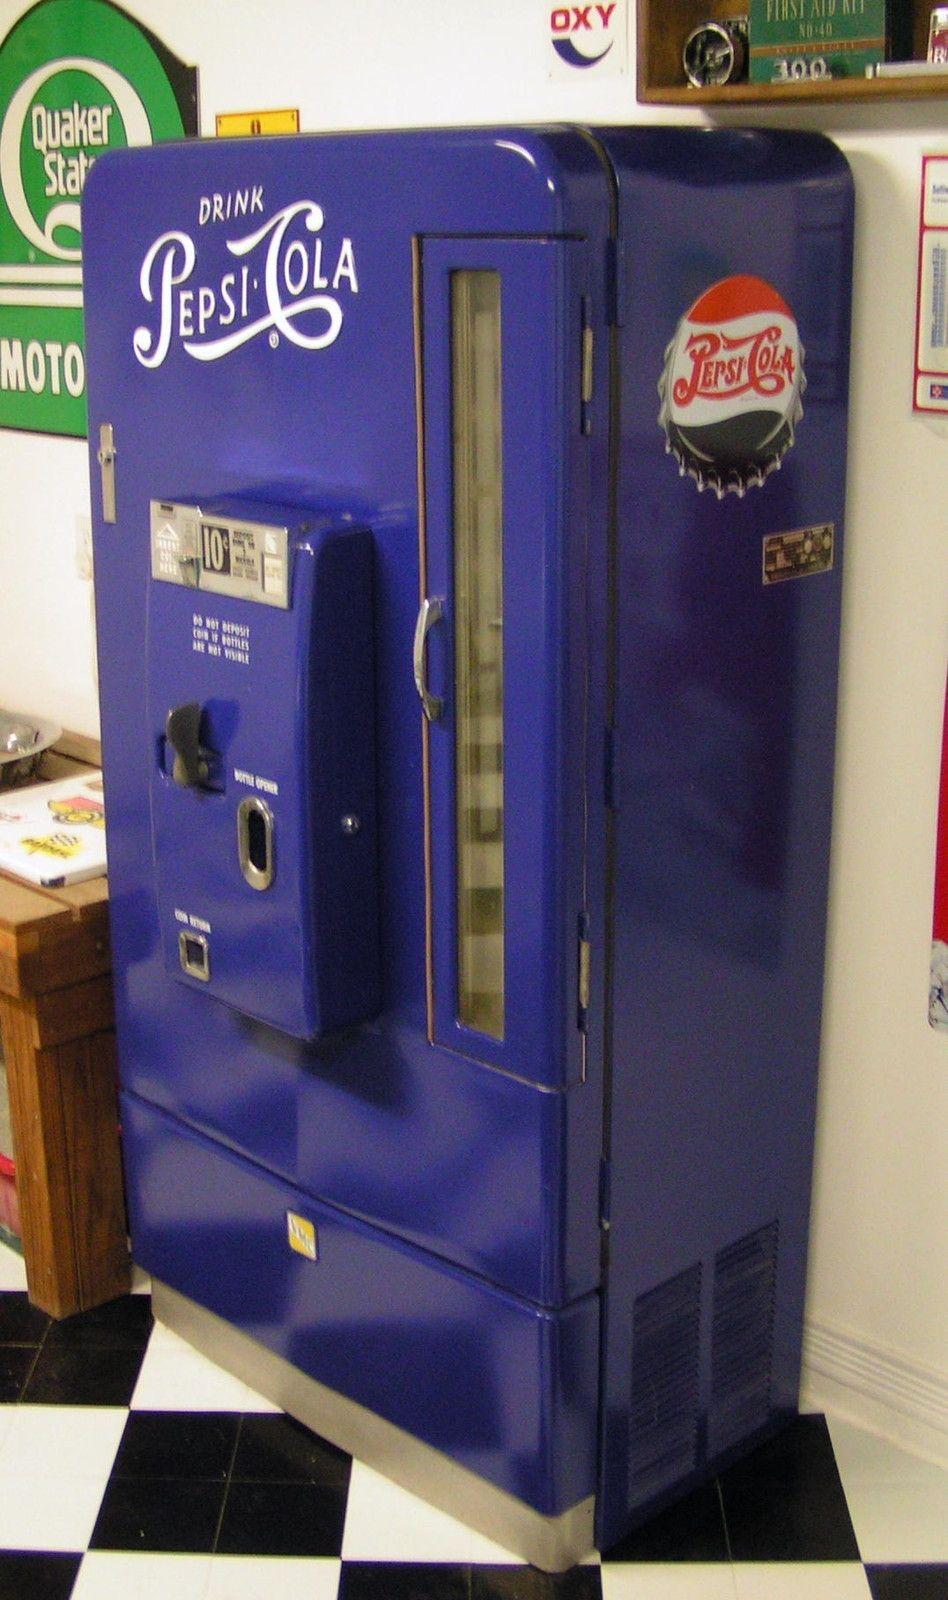 Coca Cola Fridge >> Details about Vintage PEPSI-COLA Vendorlator VMC 110 Restored Soda Pop Vending Machine | Pepsi ...